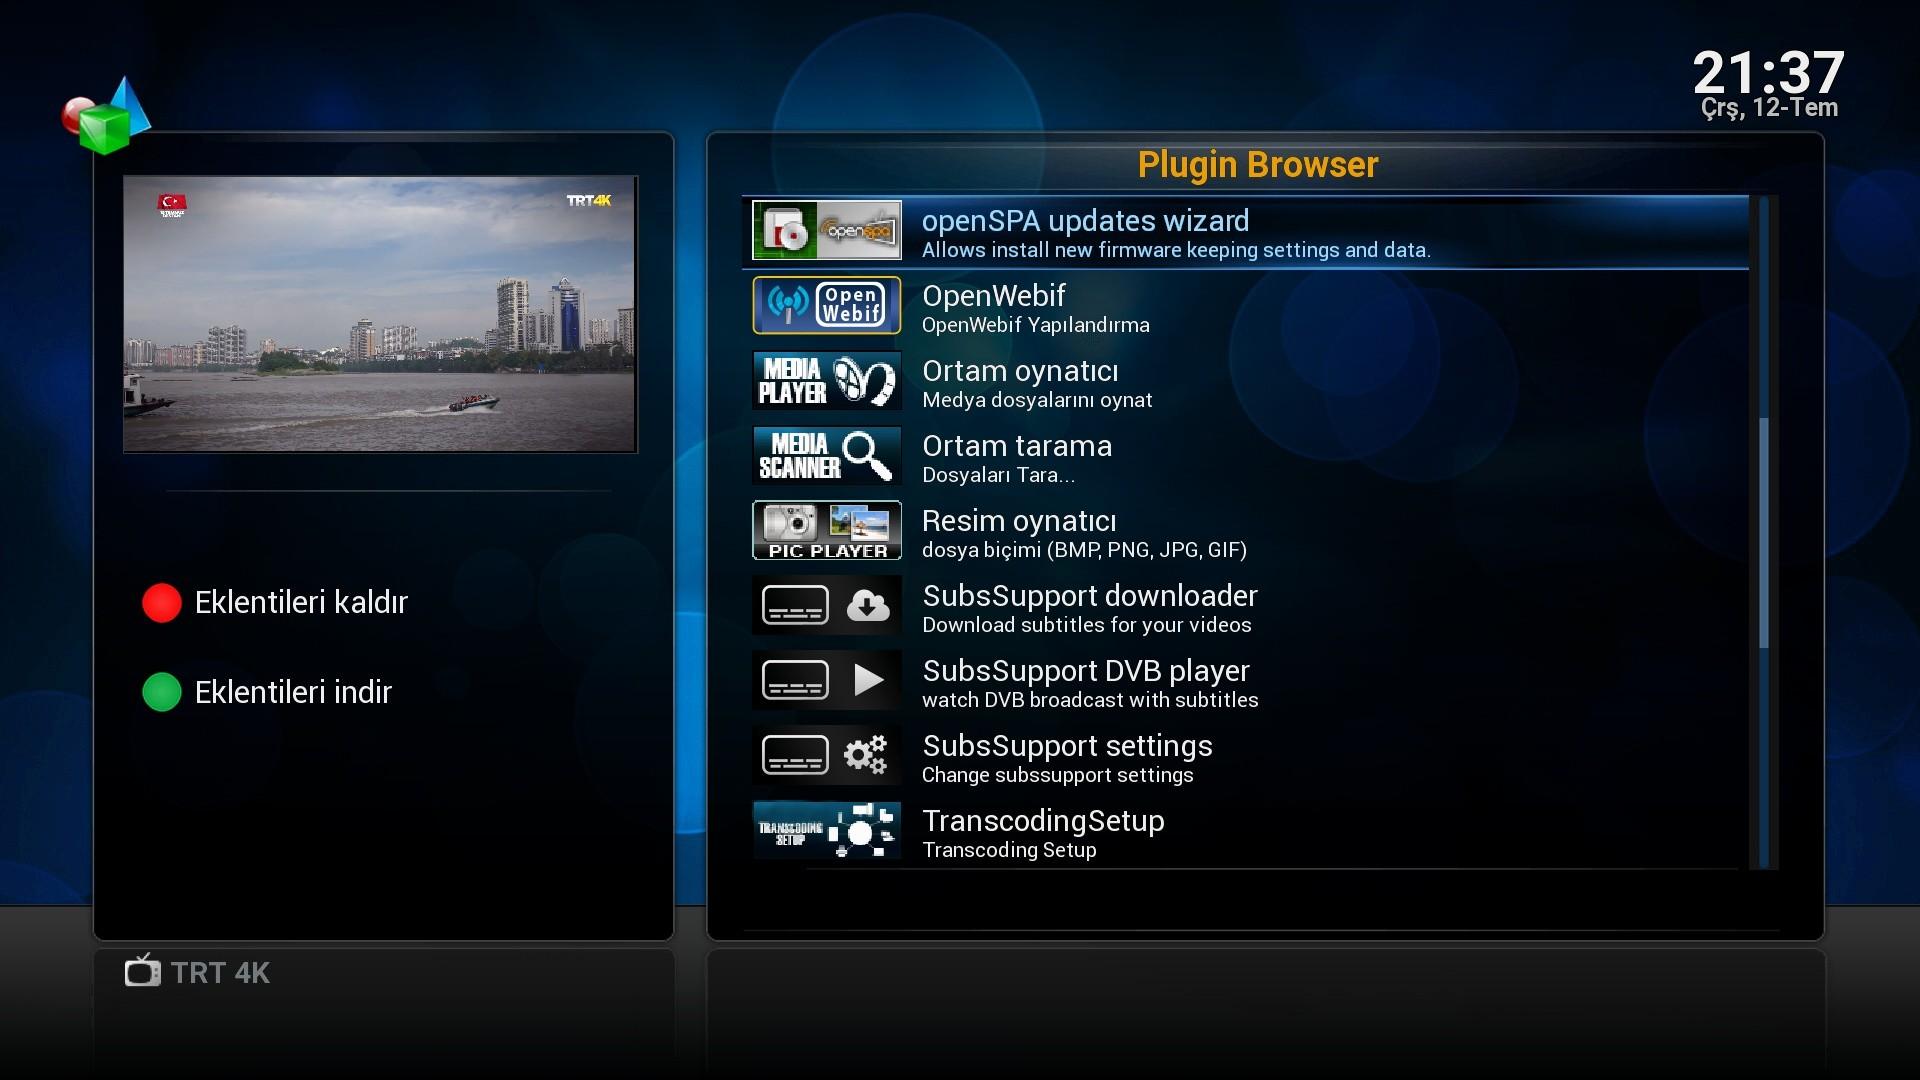 OpenSpa7 Vu+ultimo 4k FurkanB Backup - Vu+ Ultimo 4K Images